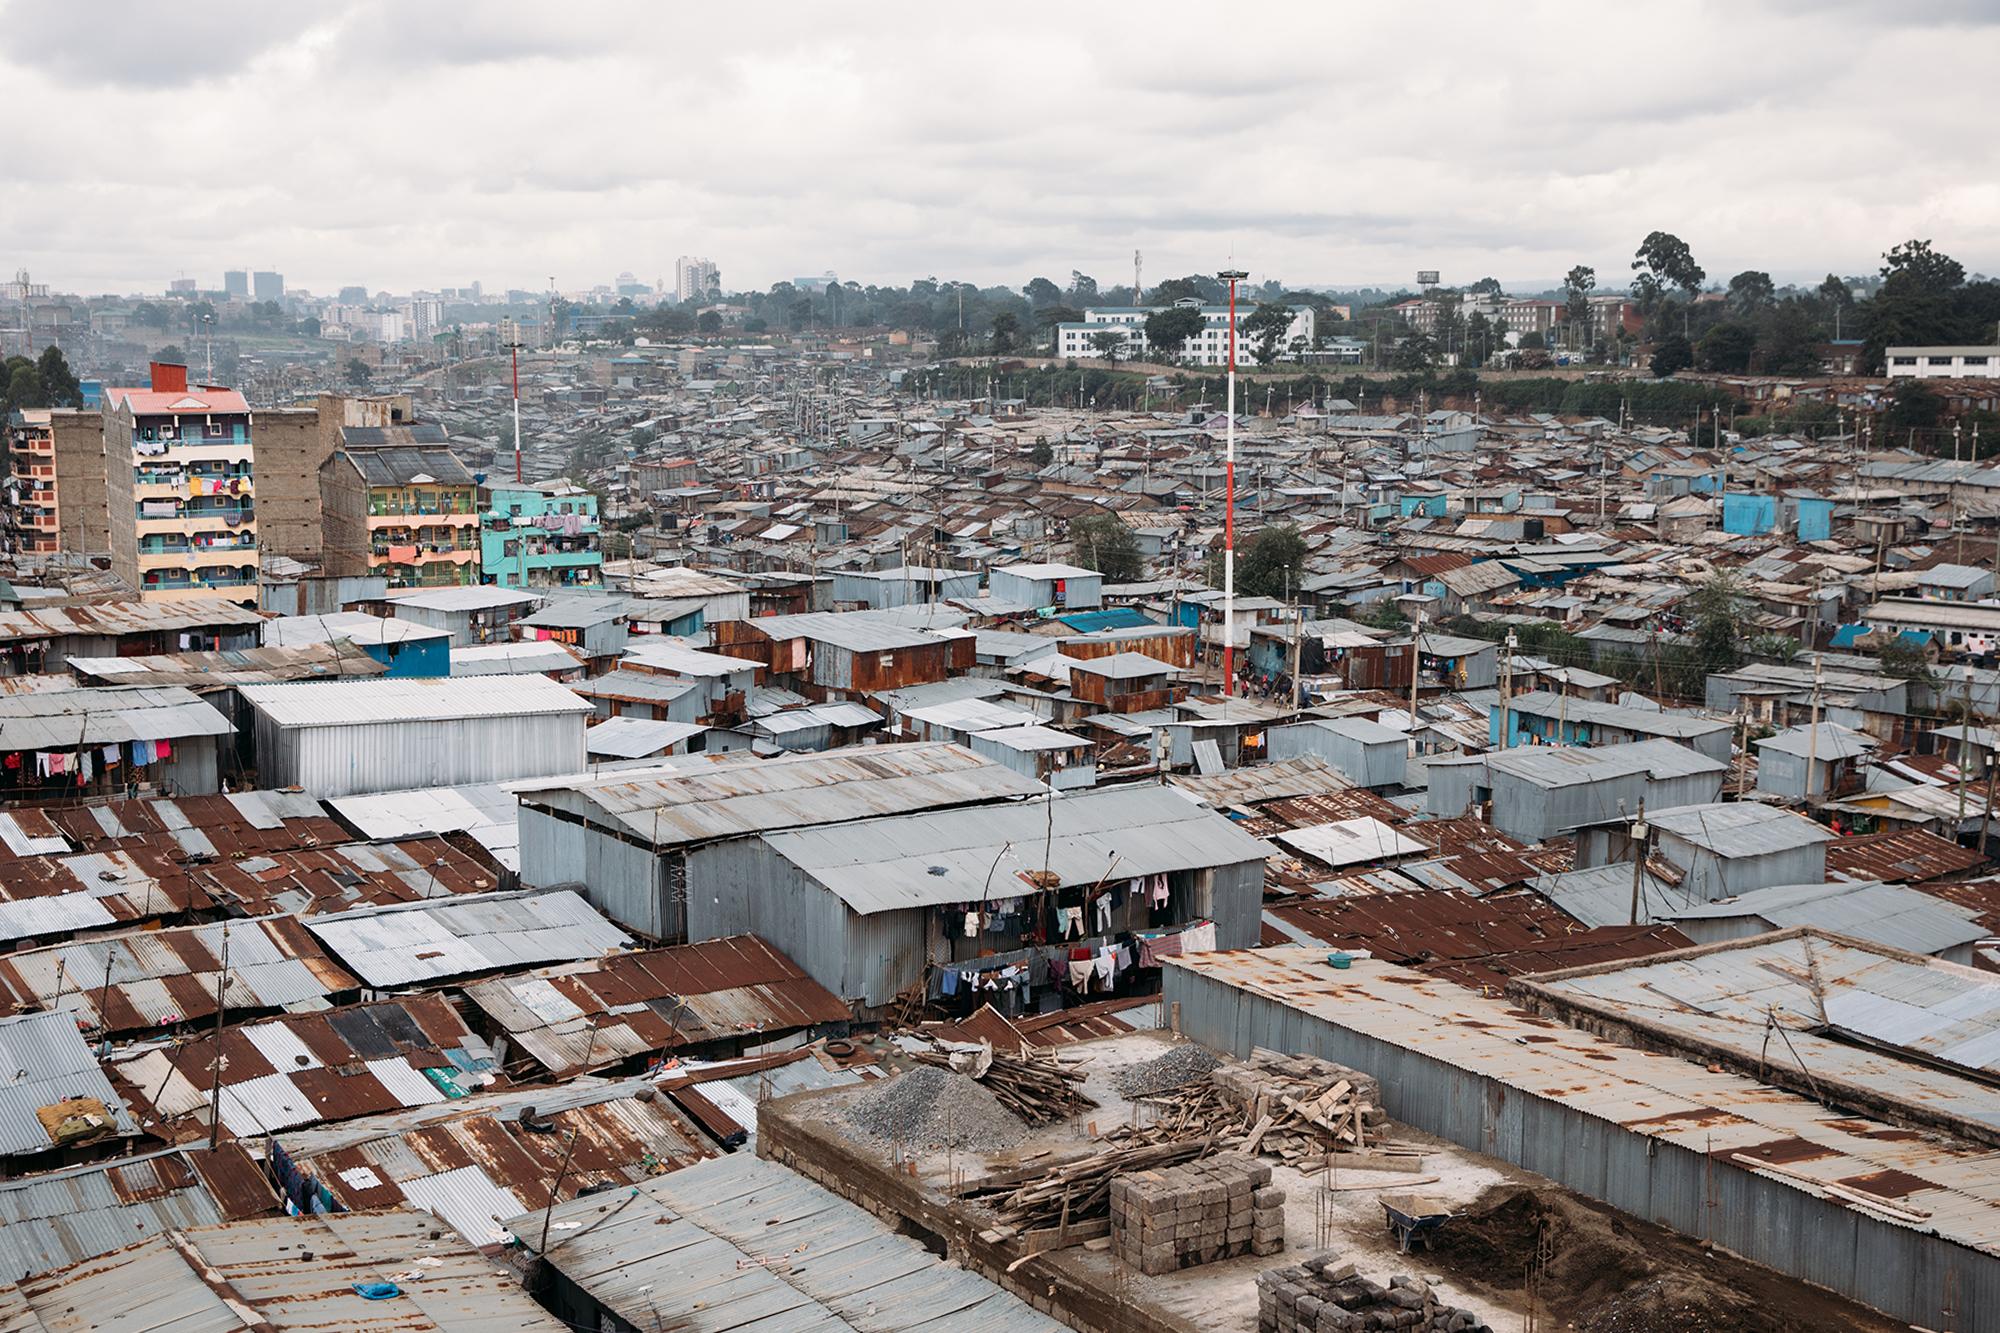 18229U_SL_Kenya_Photos_Edits-190-1